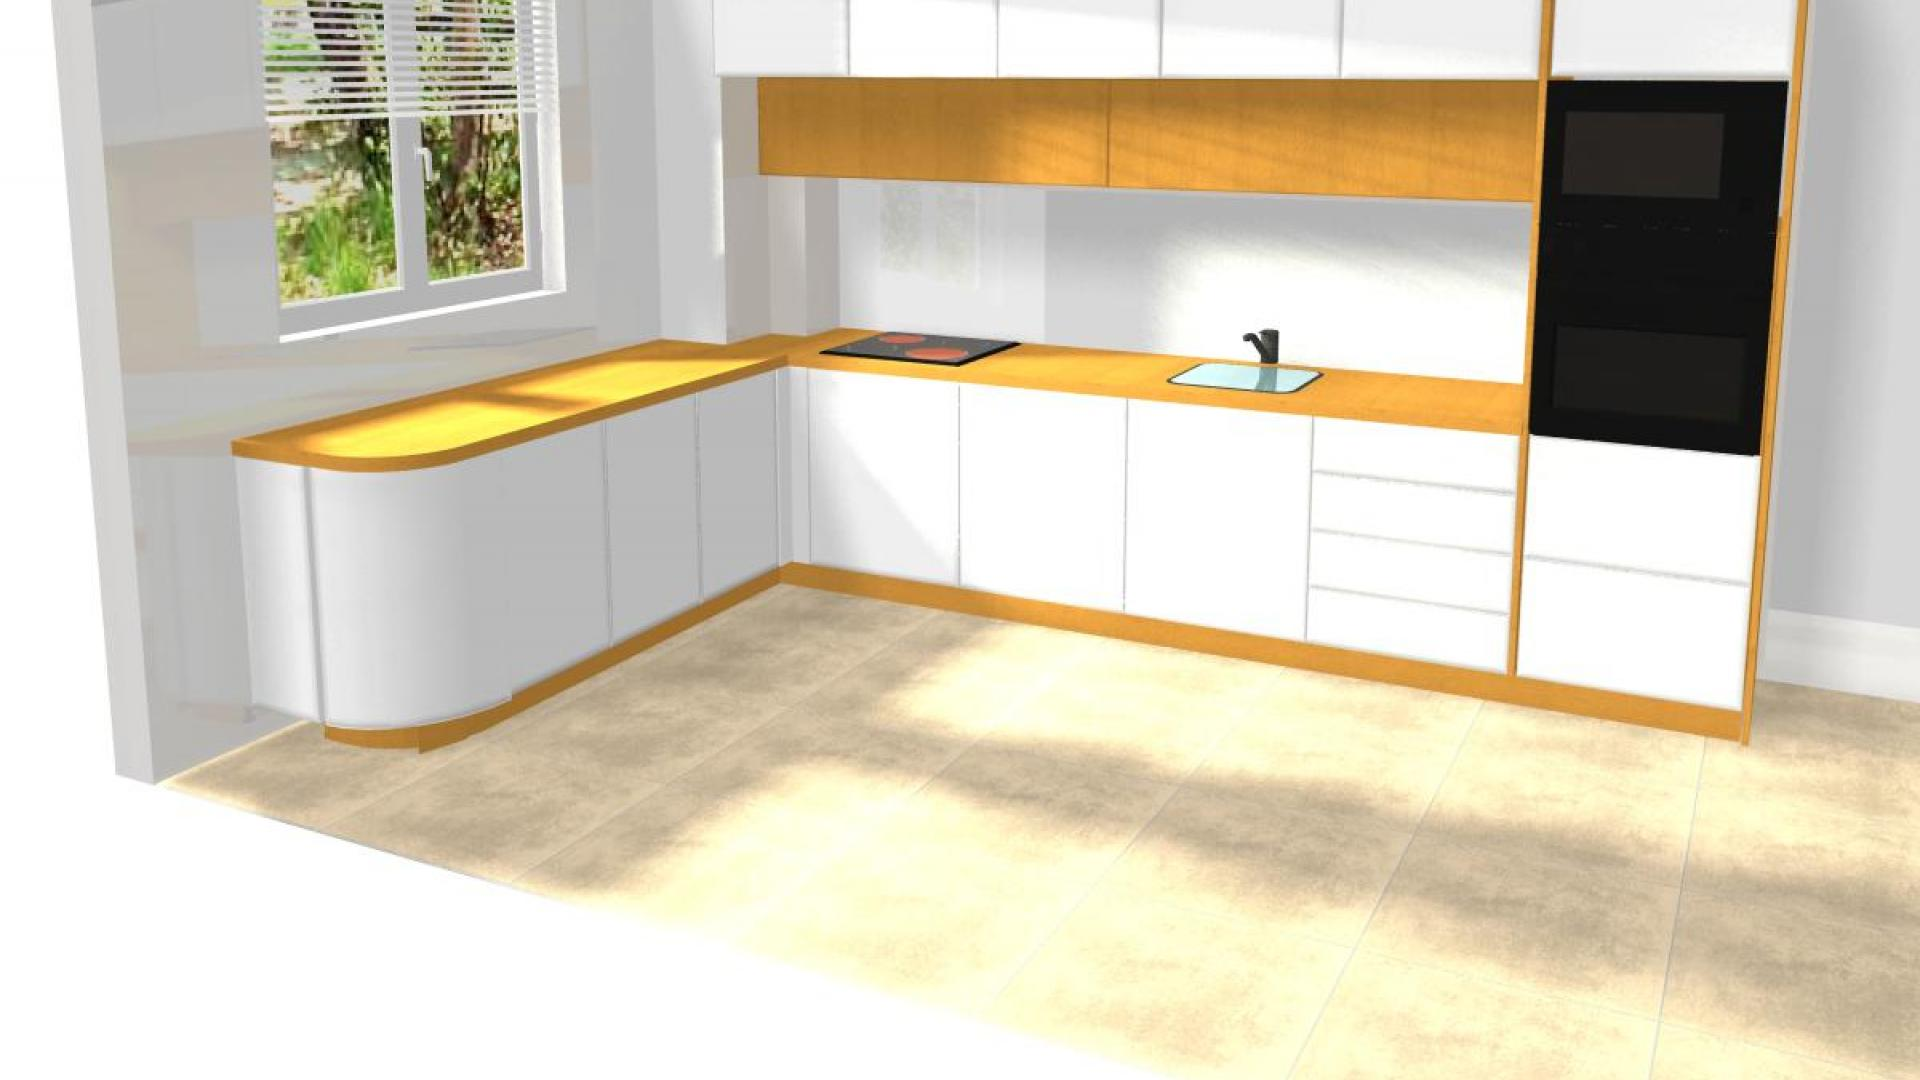 Kухня по проект Кitchen G&D